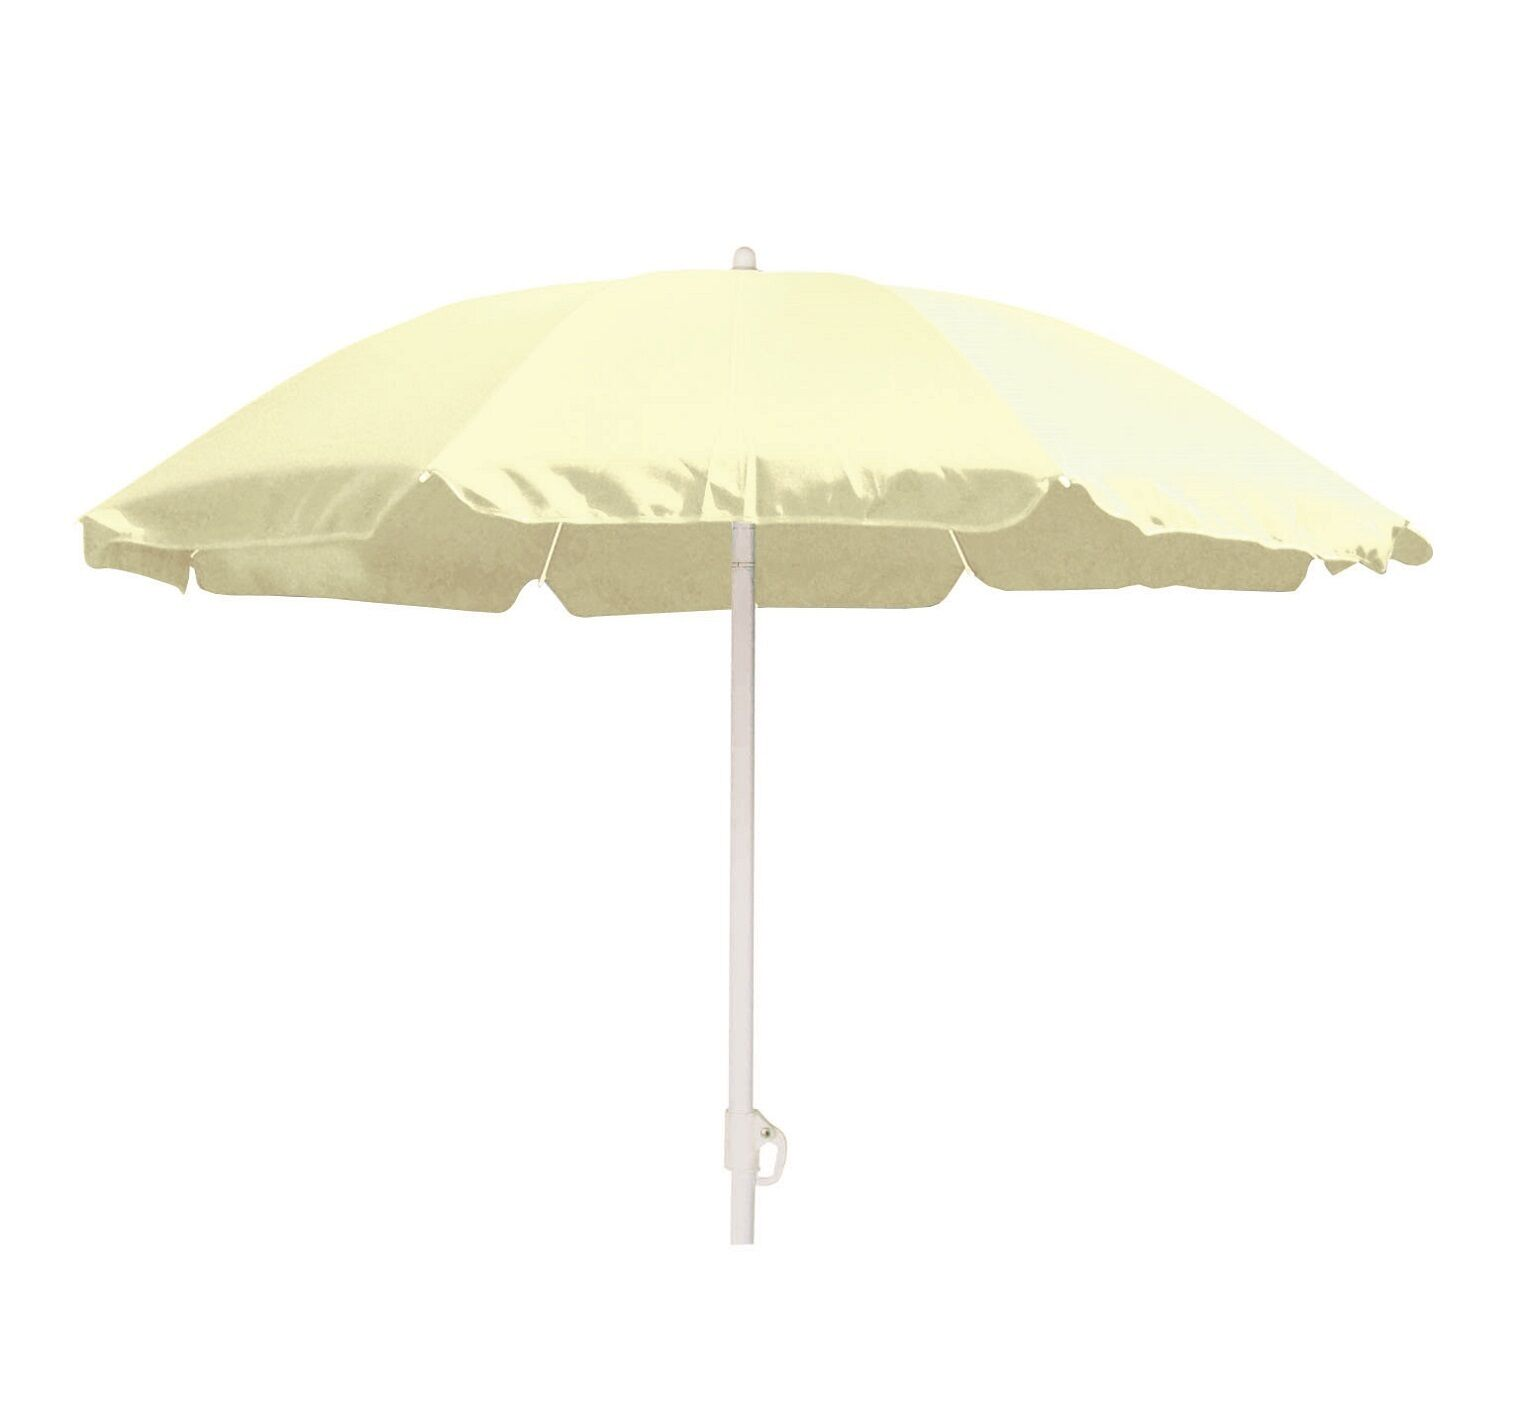 strandschirm sonnenschirm gartenschirm knickbar camping schirm uv schutz alu ebay. Black Bedroom Furniture Sets. Home Design Ideas